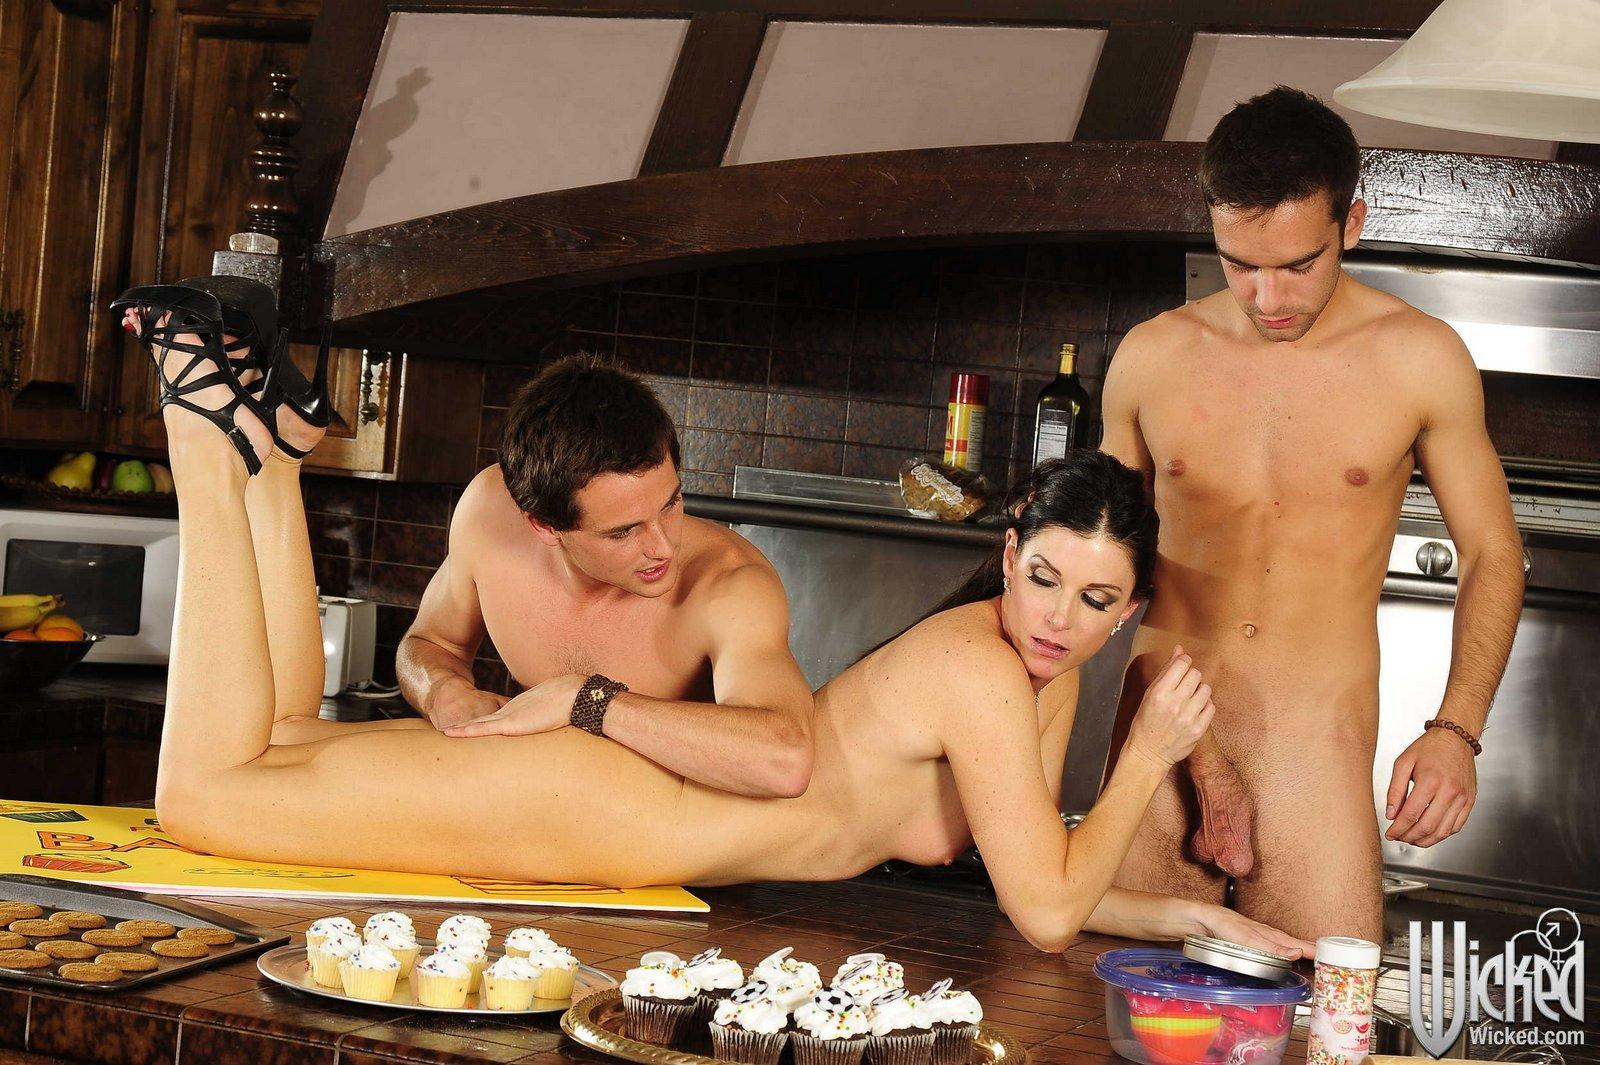 Bbw nude in public nude images